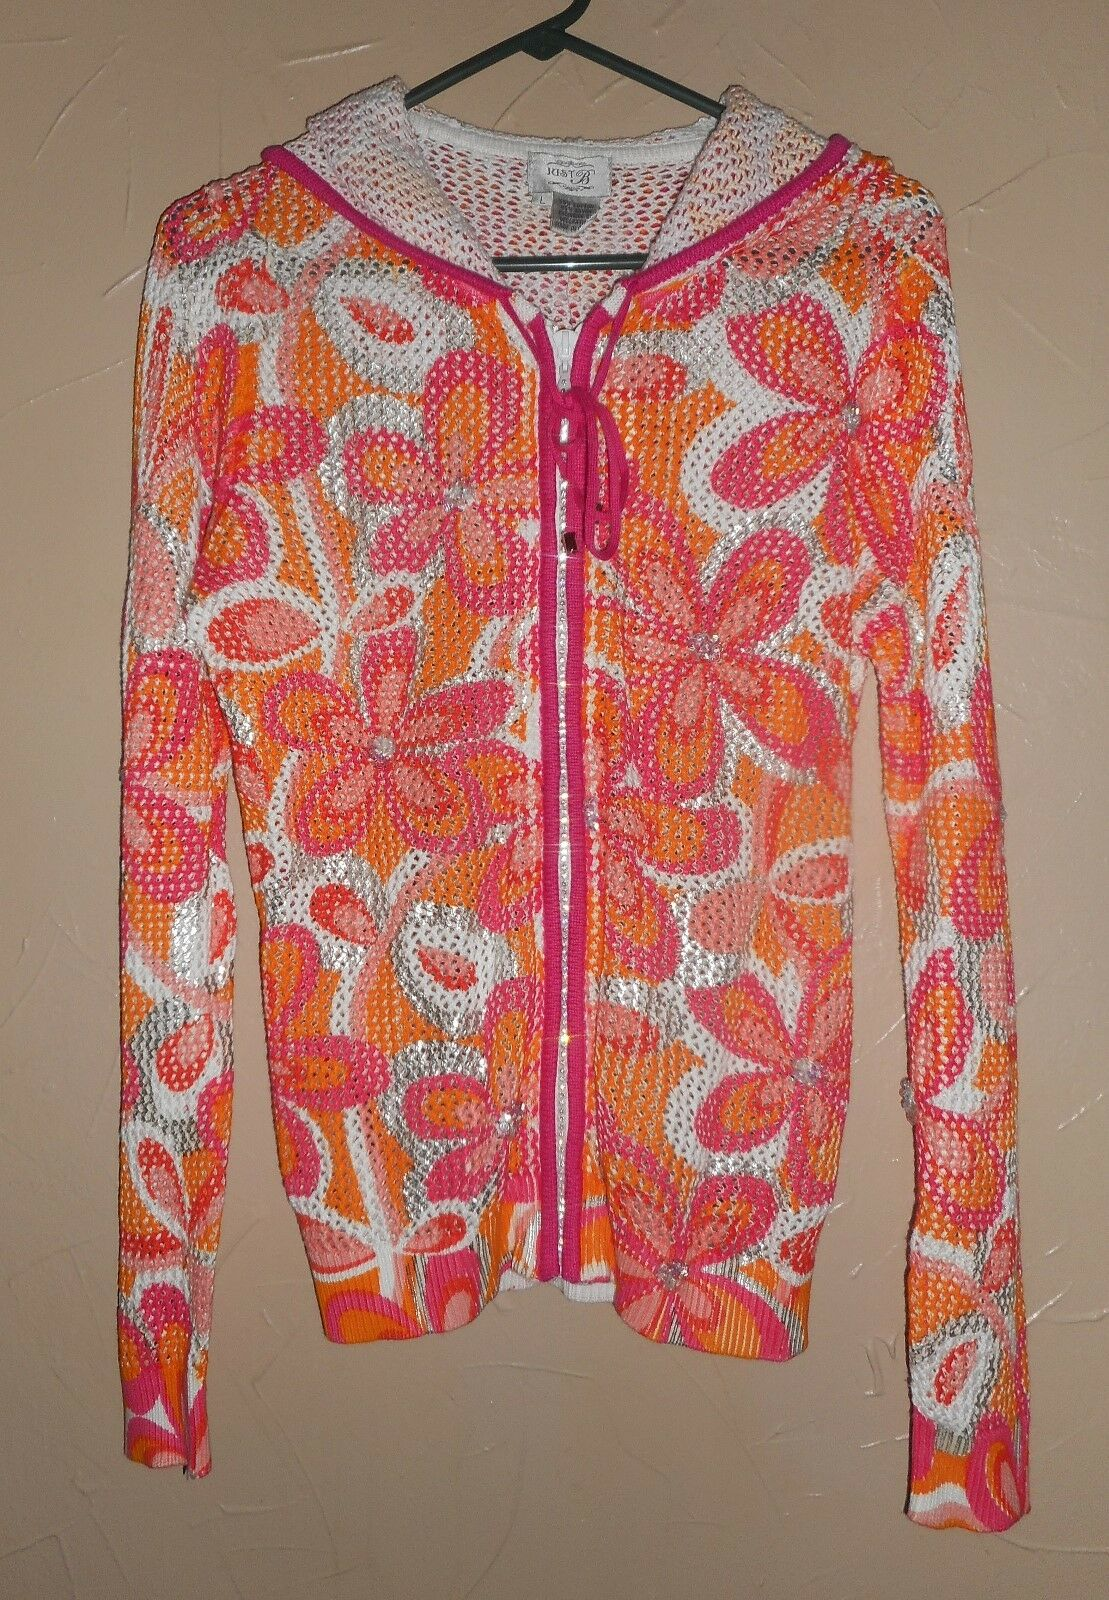 JUST B SEQUIN GLITTER RHINESTONES Floral CARDIGAN hoodie SWEATER, BEACH WRAP L